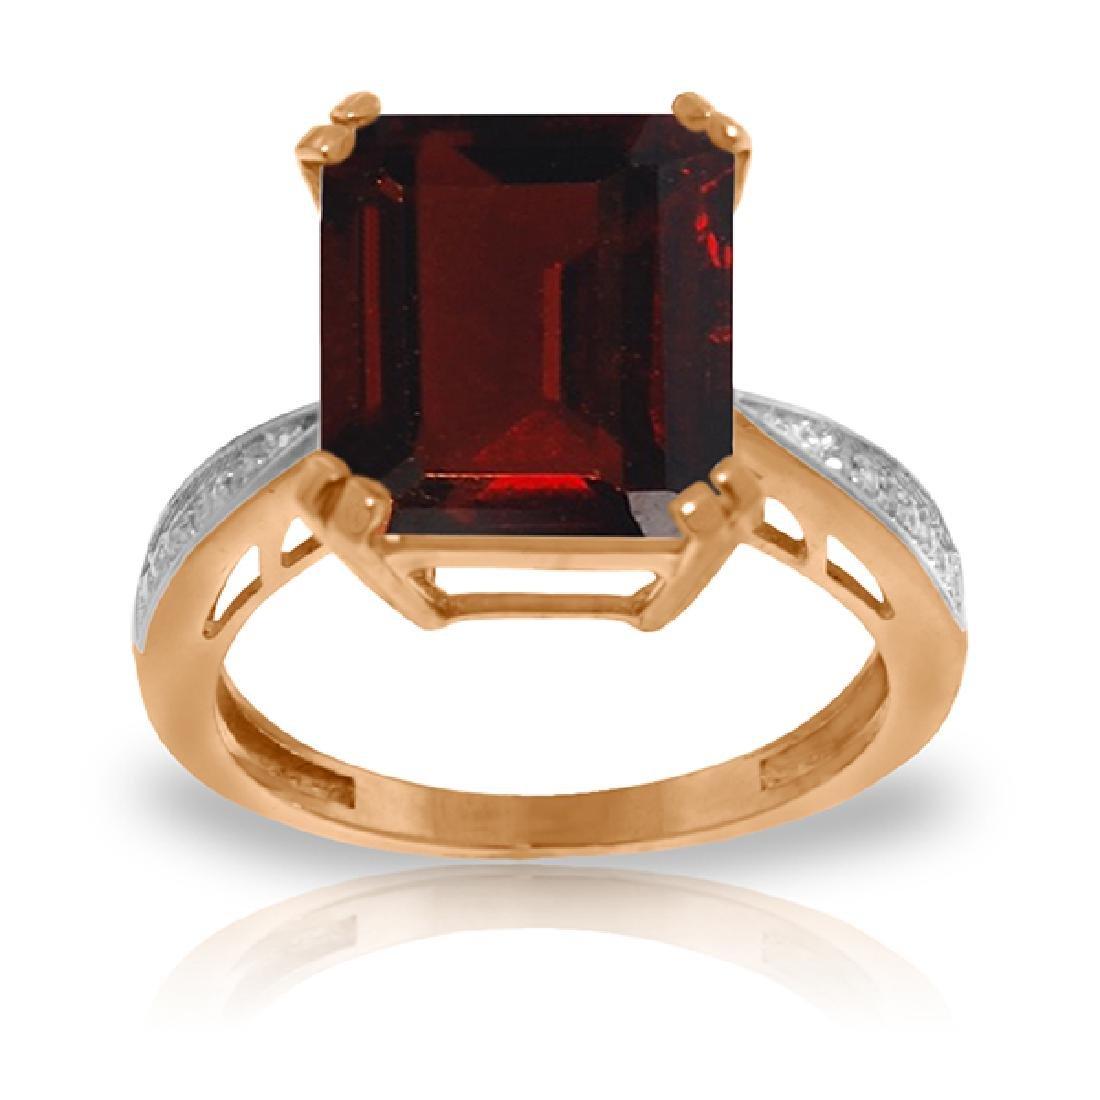 Genuine 7.52 ctw Garnet & Diamond Ring Jewelry 14KT